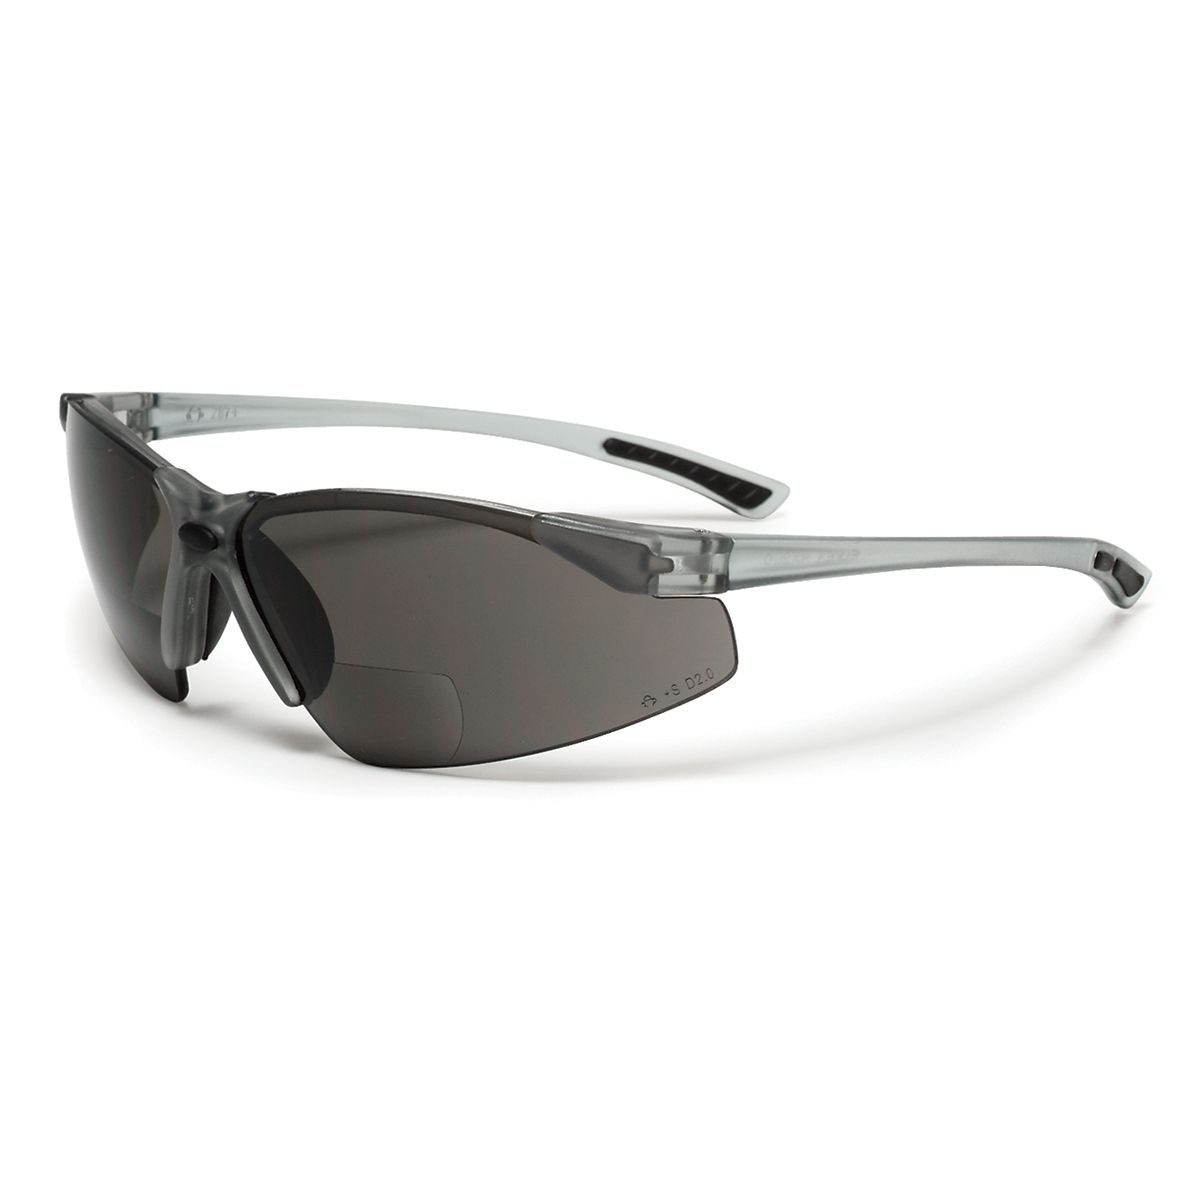 Bifocal safety reading glasses glasses bifocal reading